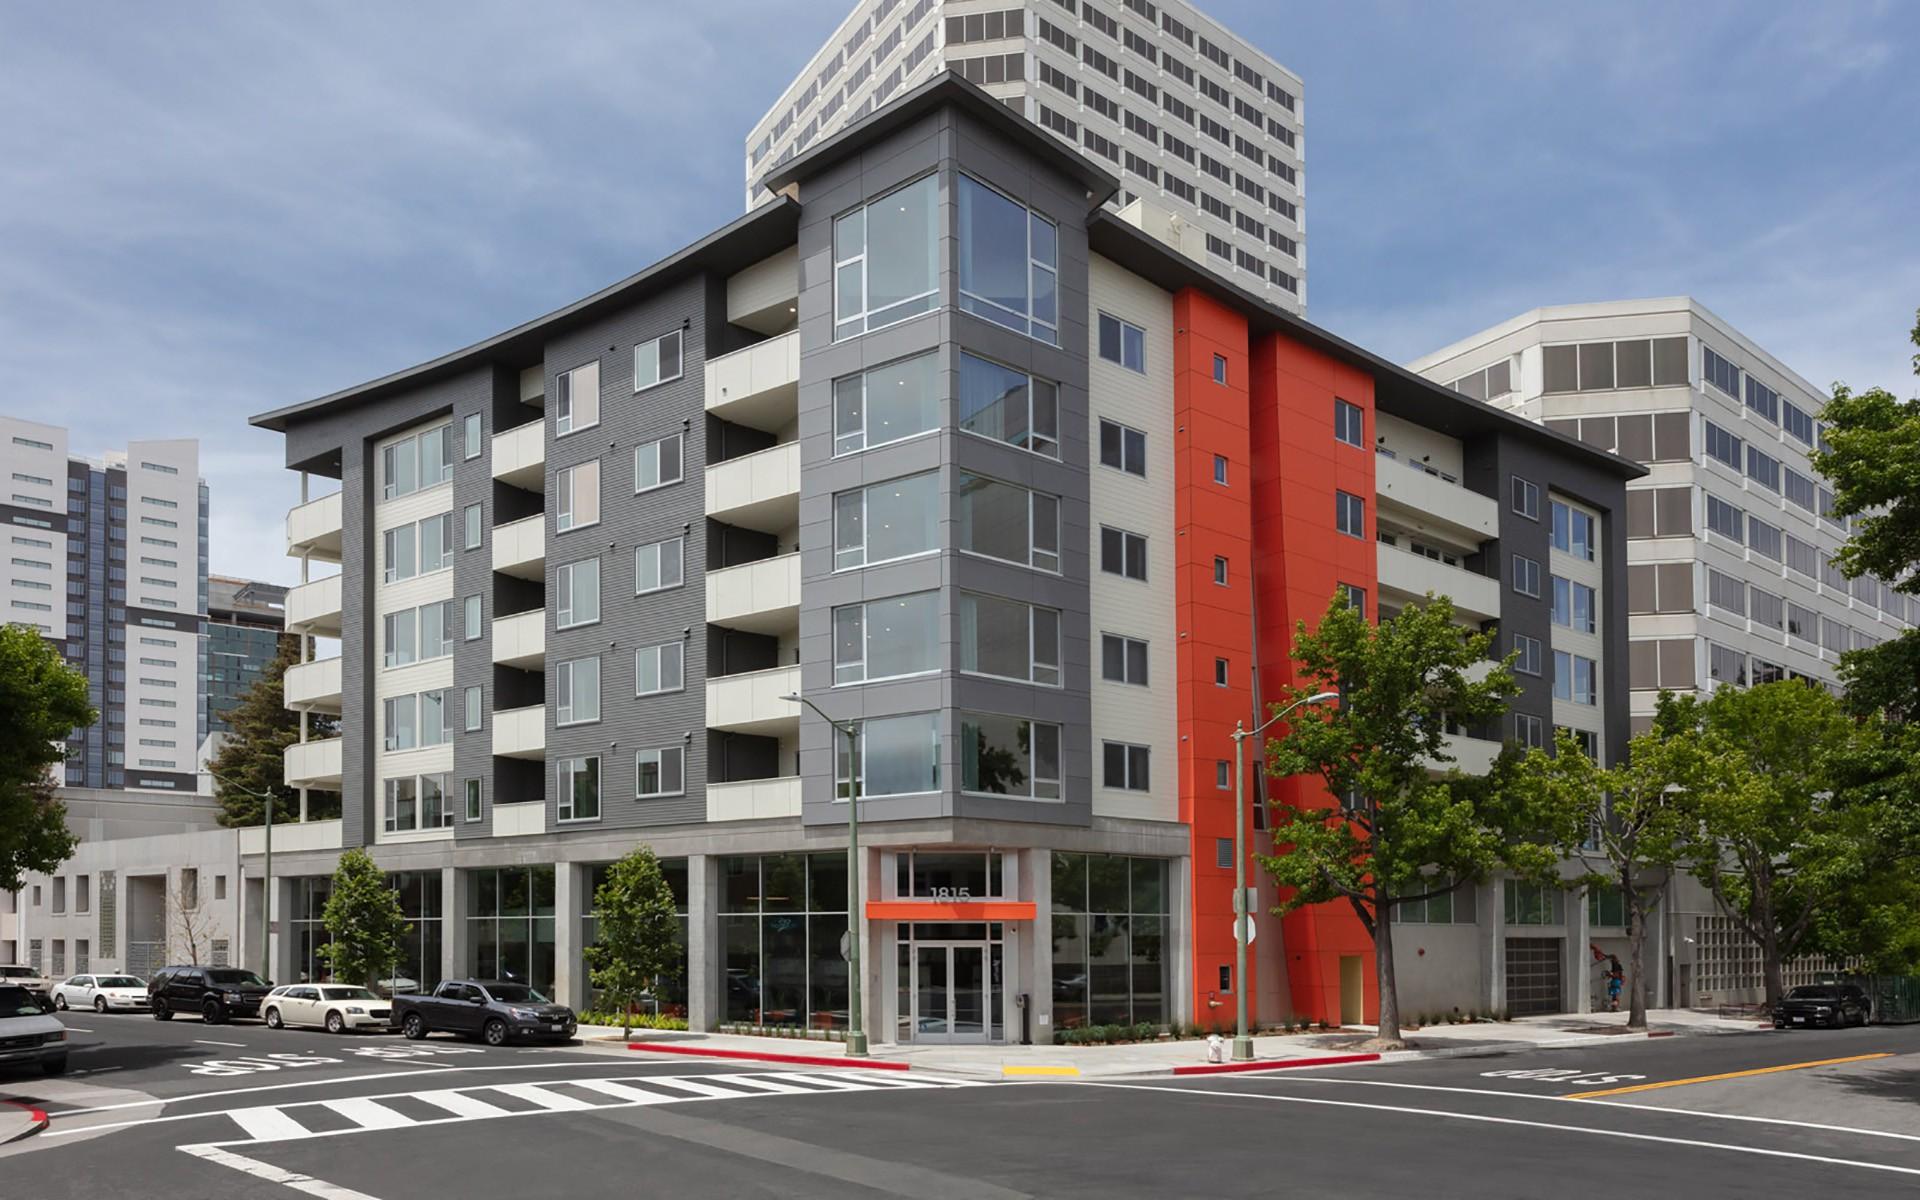 Apartments Near UC Berkeley Halcyon for University of California - Berkeley Students in Berkeley, CA